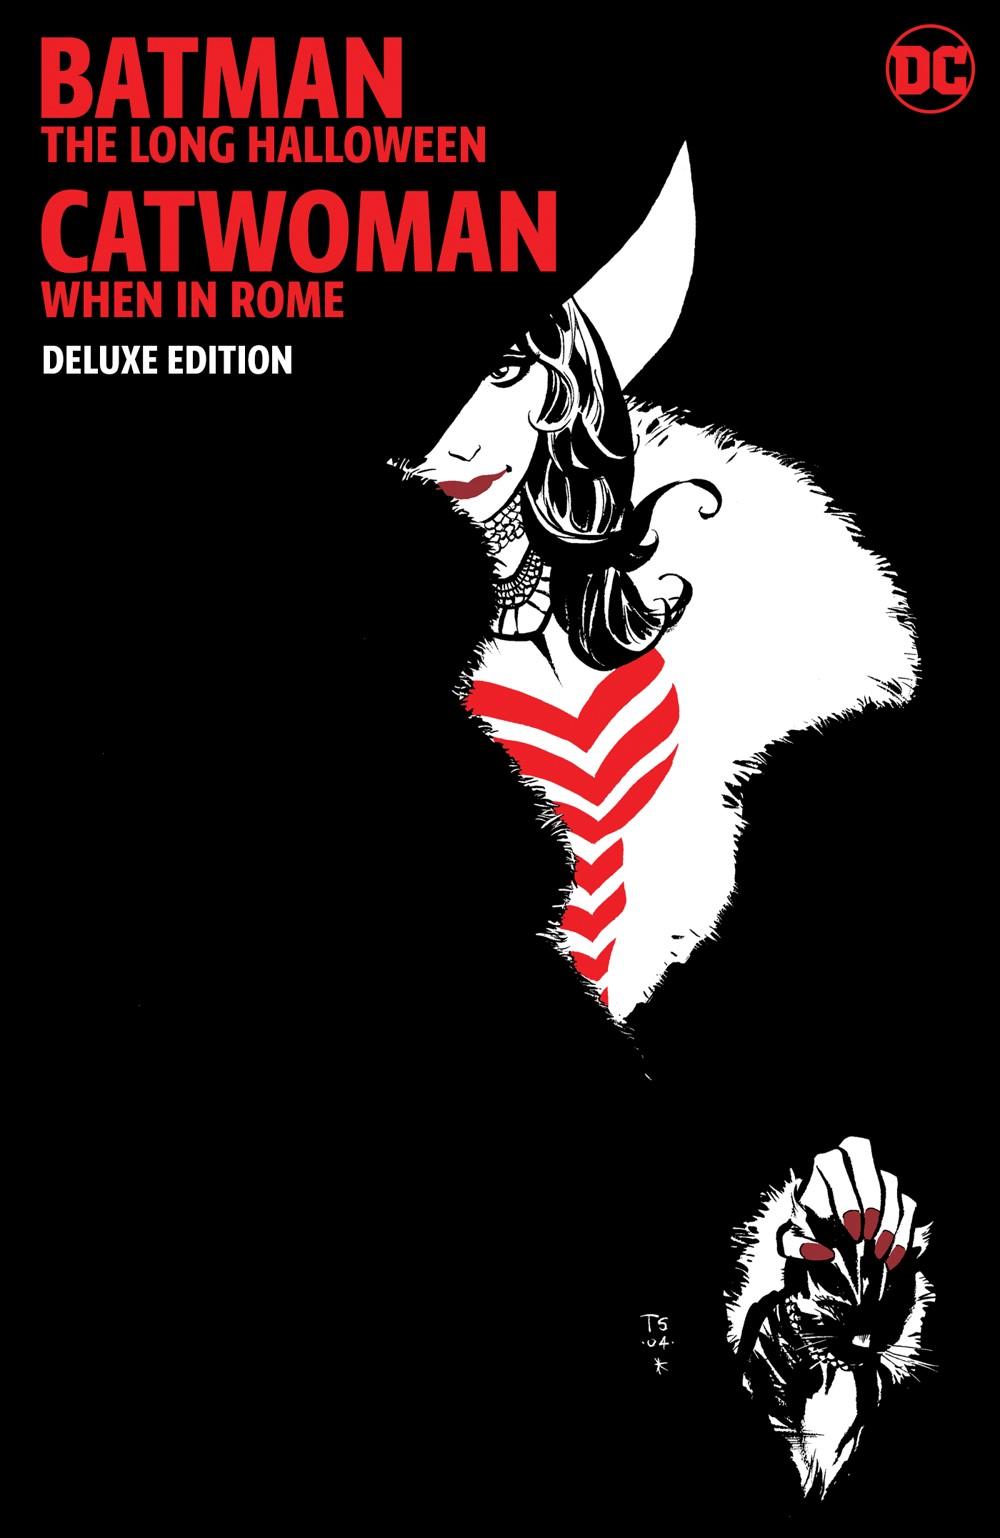 batmanlonghalloweencatwomanwheninrome-dlx DC Comics December 2021 Solicitations